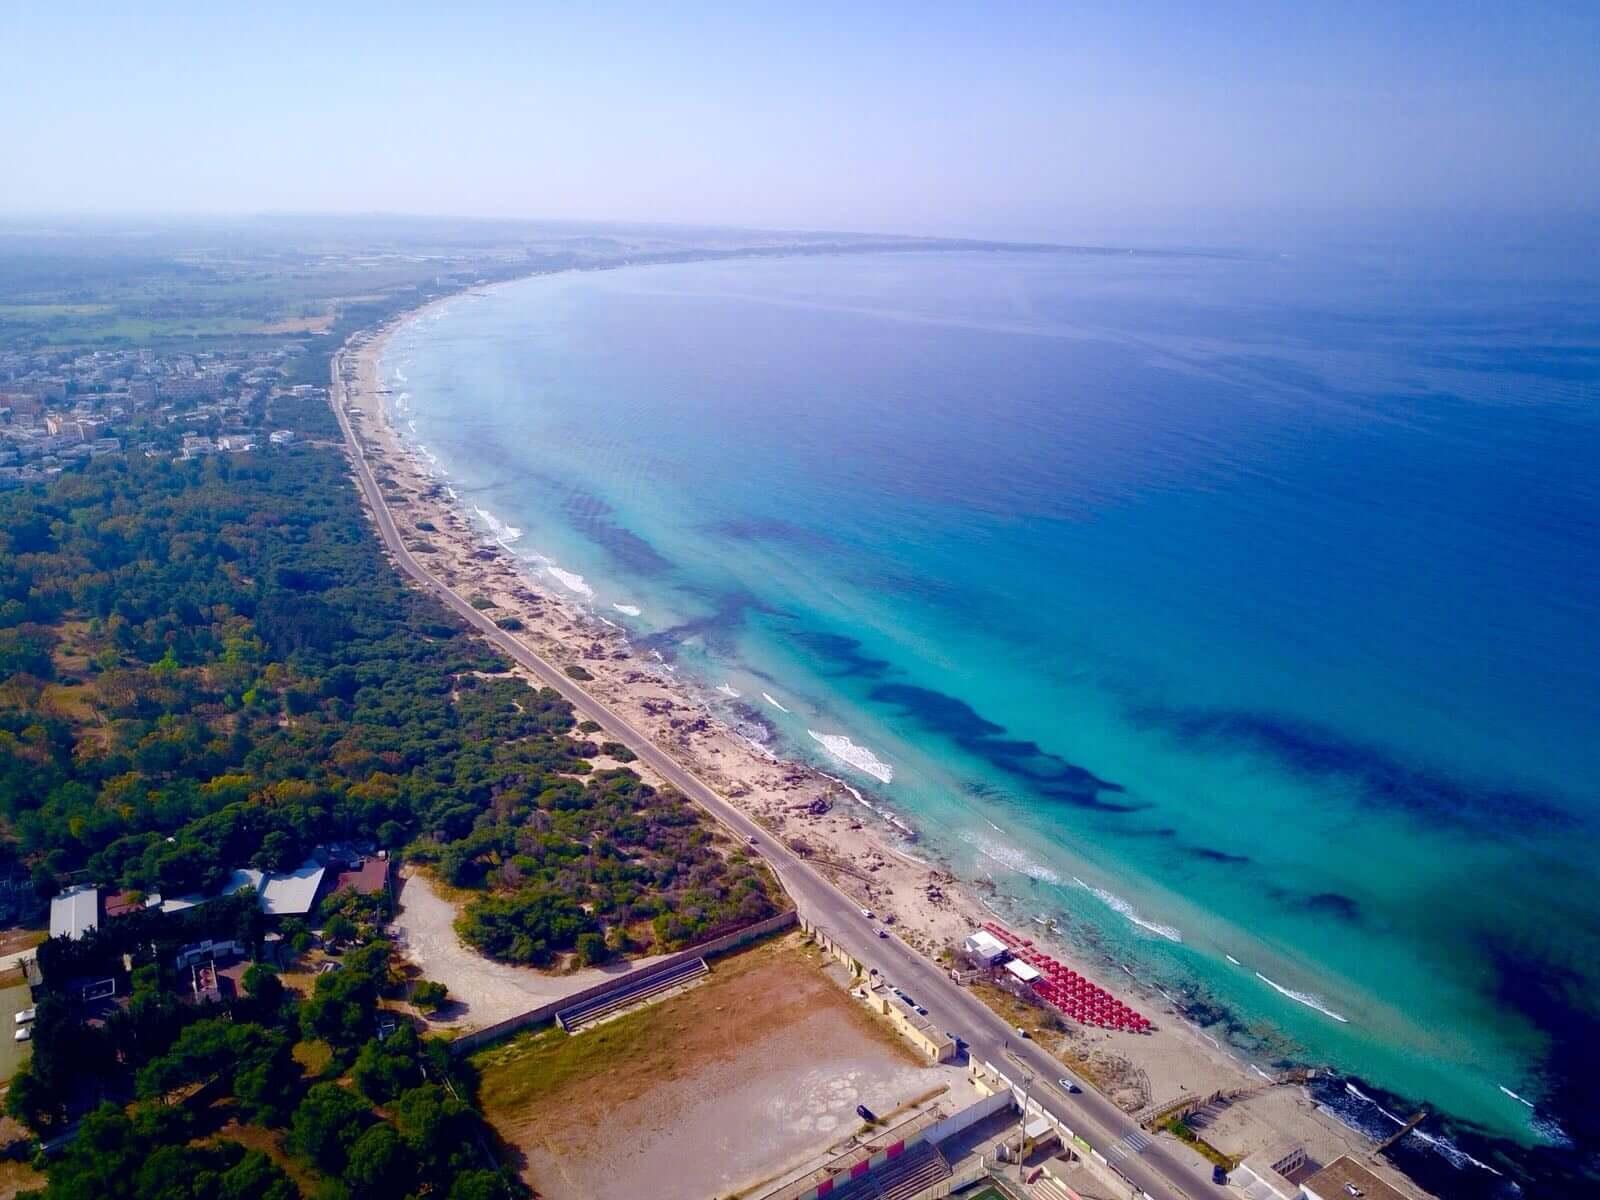 The Gallipoli beach of purity